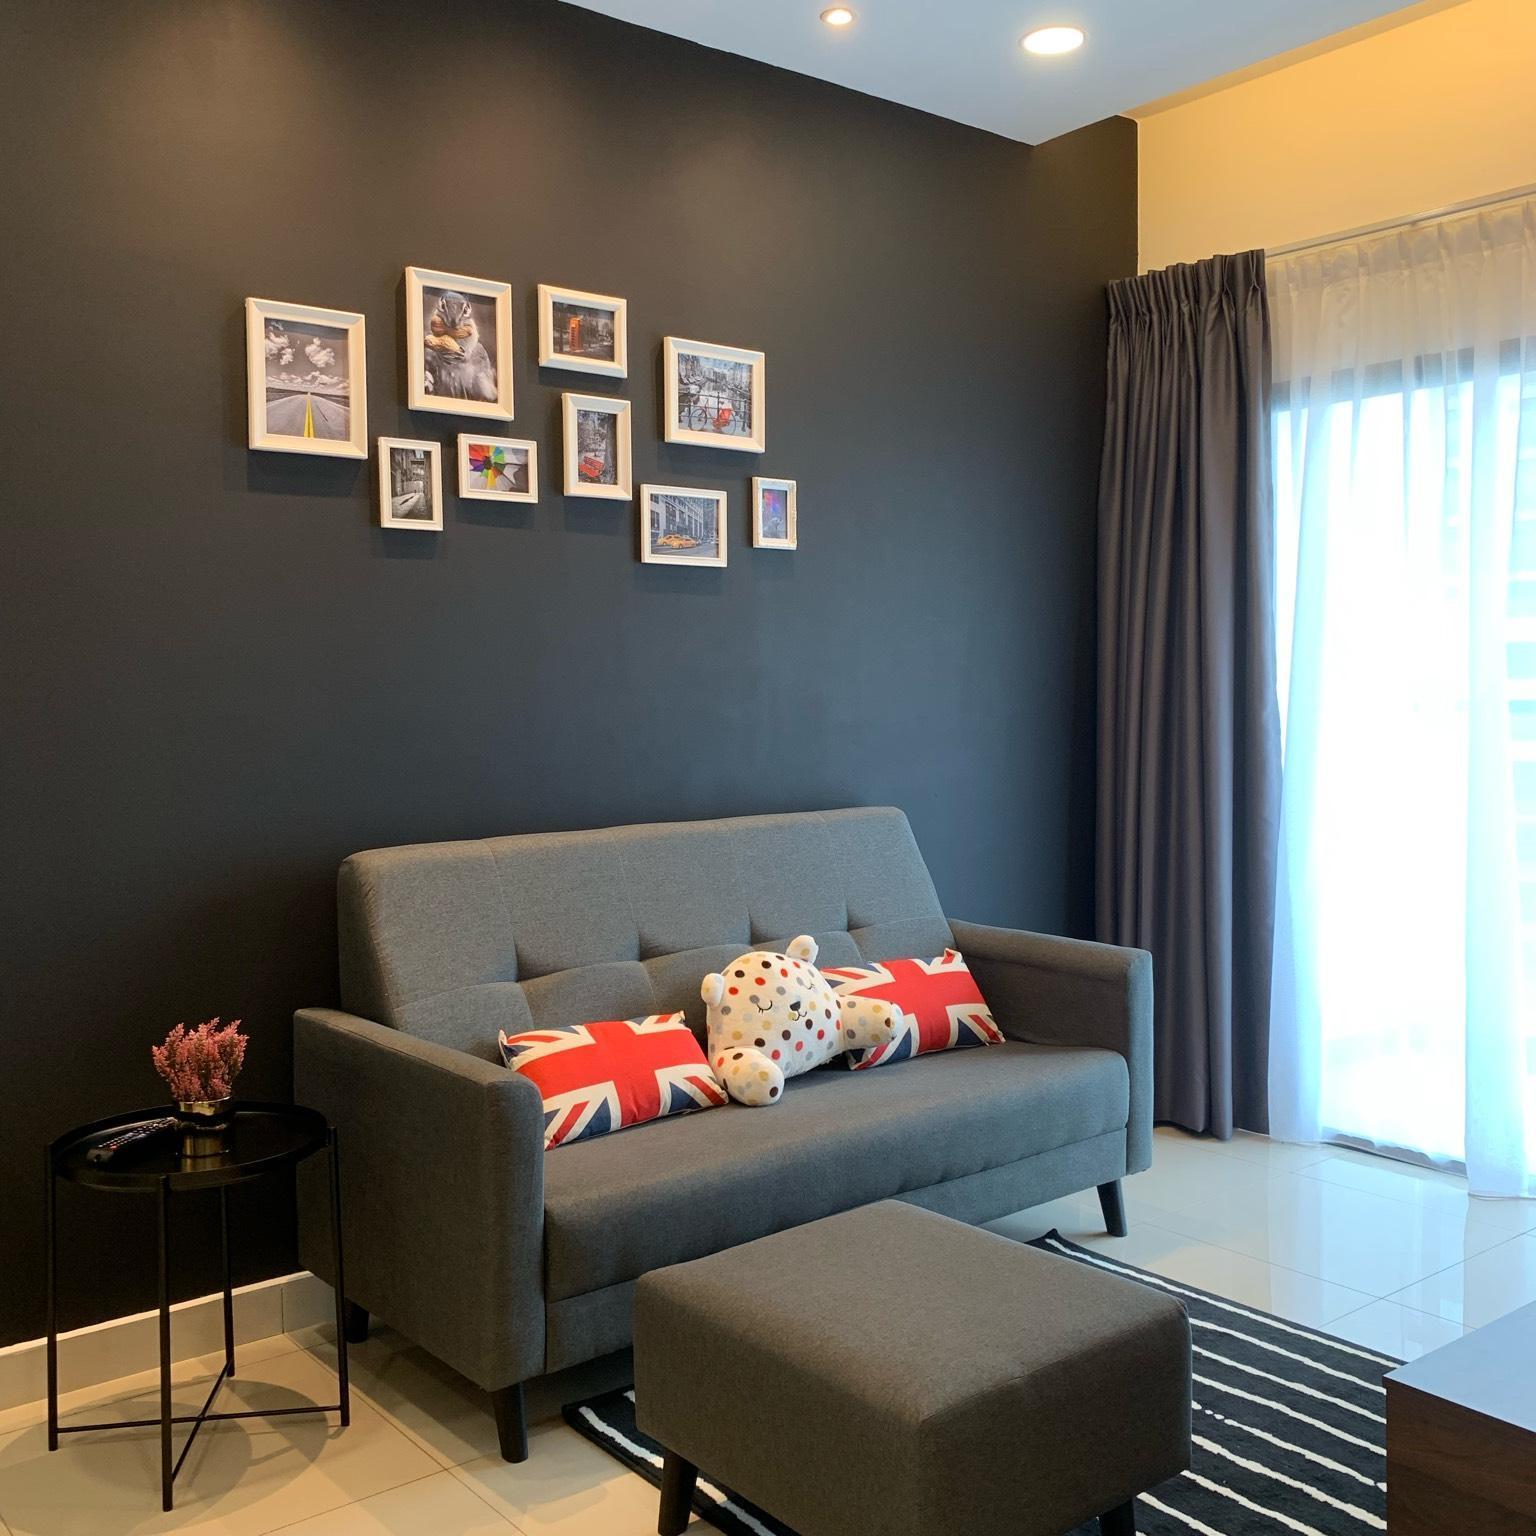 COZY HOME Wifi SUNGAI LONG MRT BALAKONG Landmark